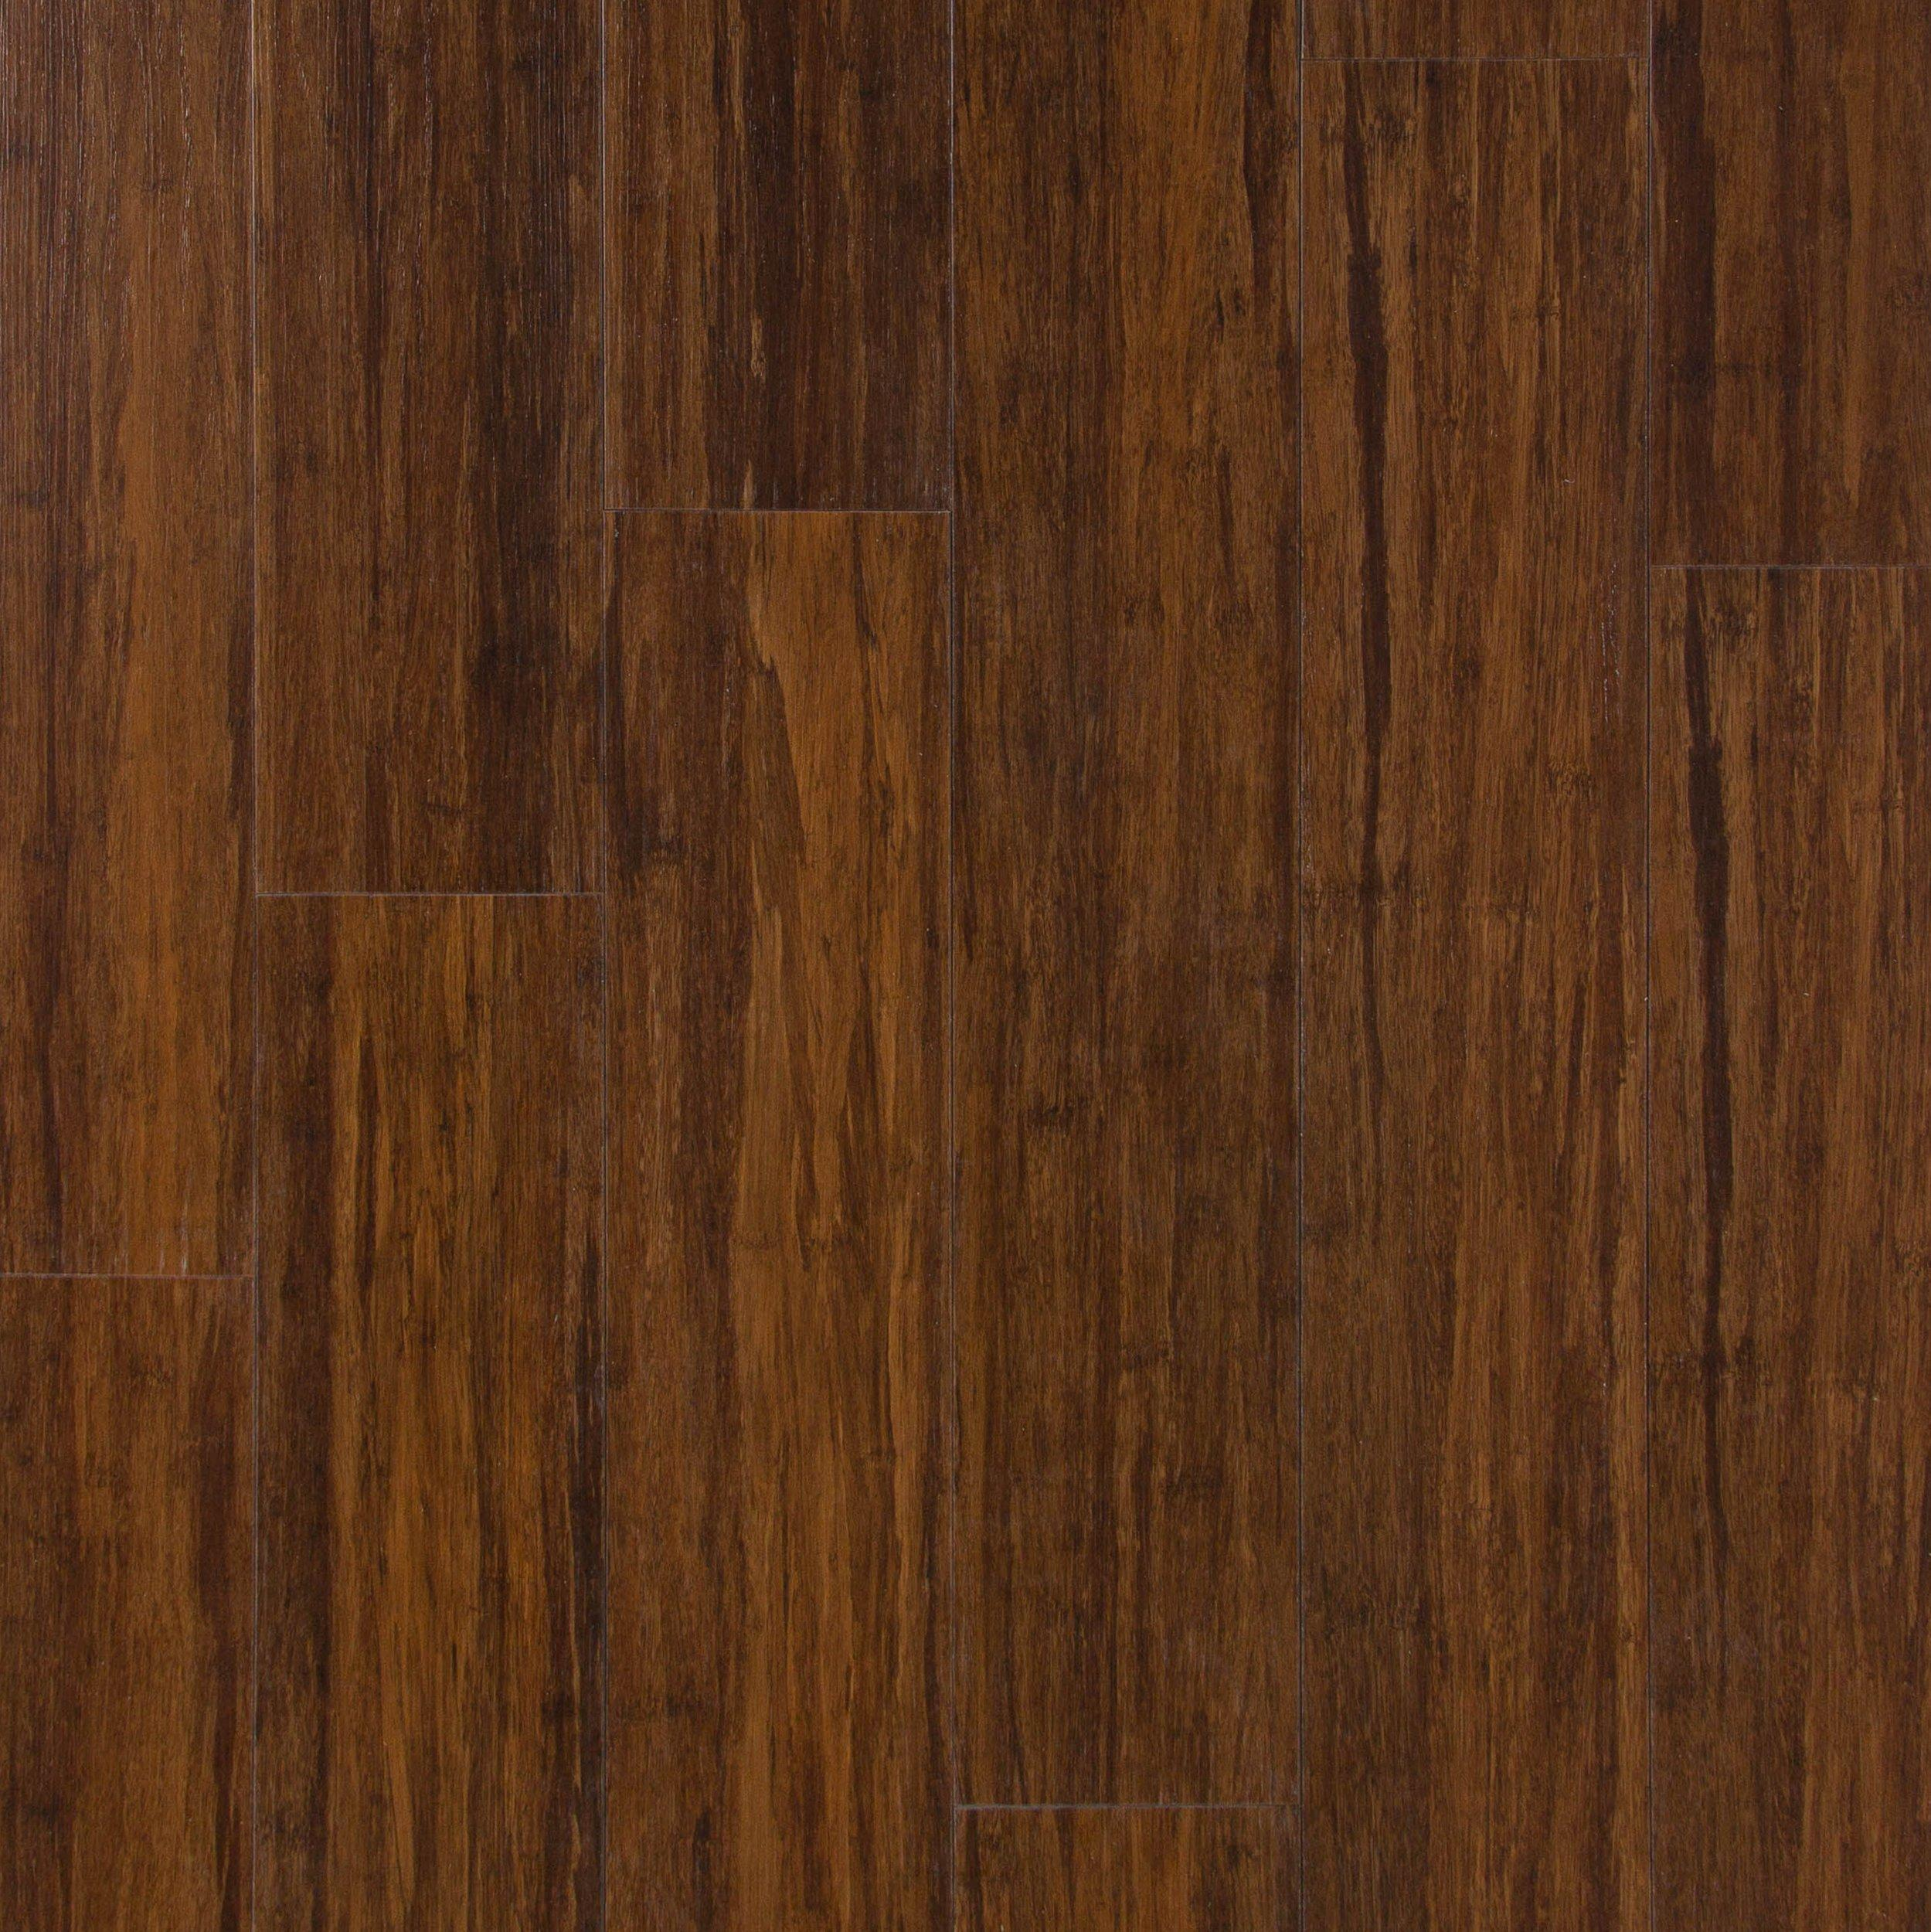 Heritage Bamboo Rigid Core Luxury Vinyl Plank Foam Back 5mm